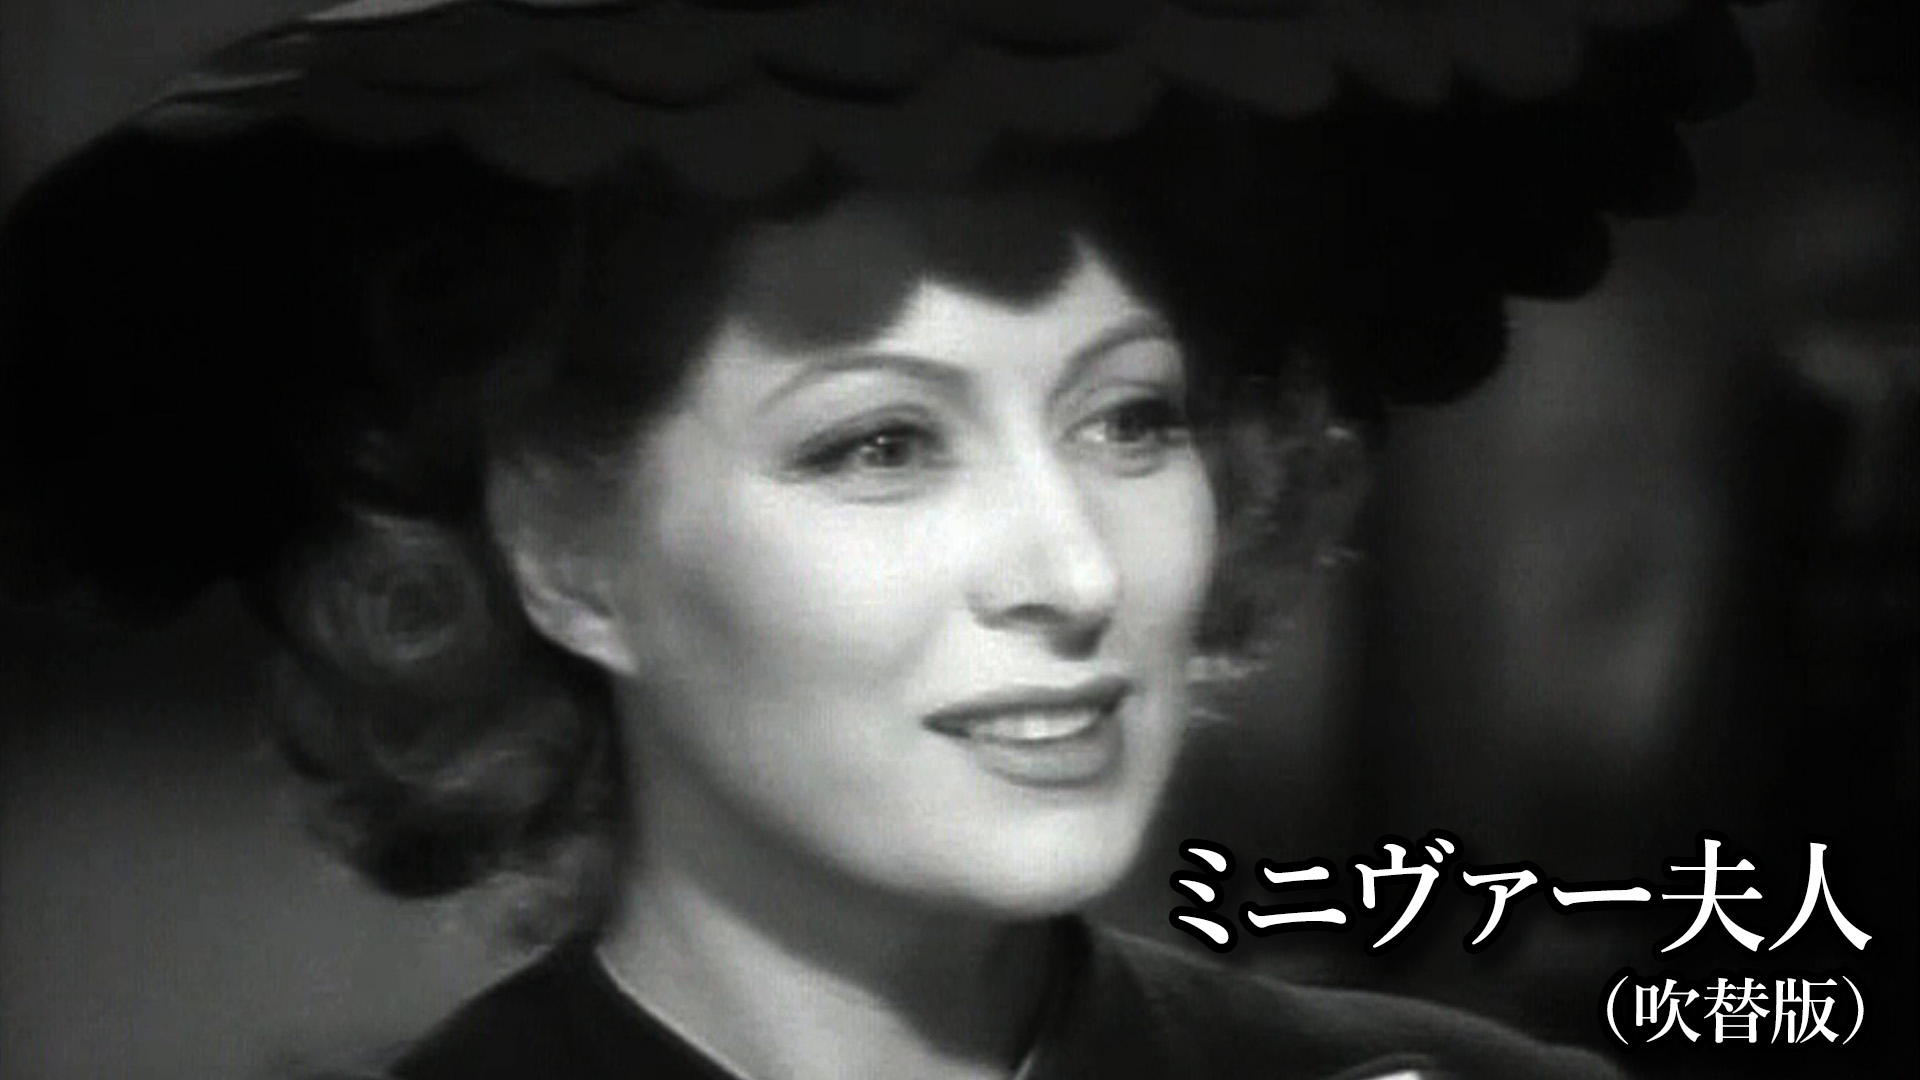 ミニヴァー夫人(吹替版)